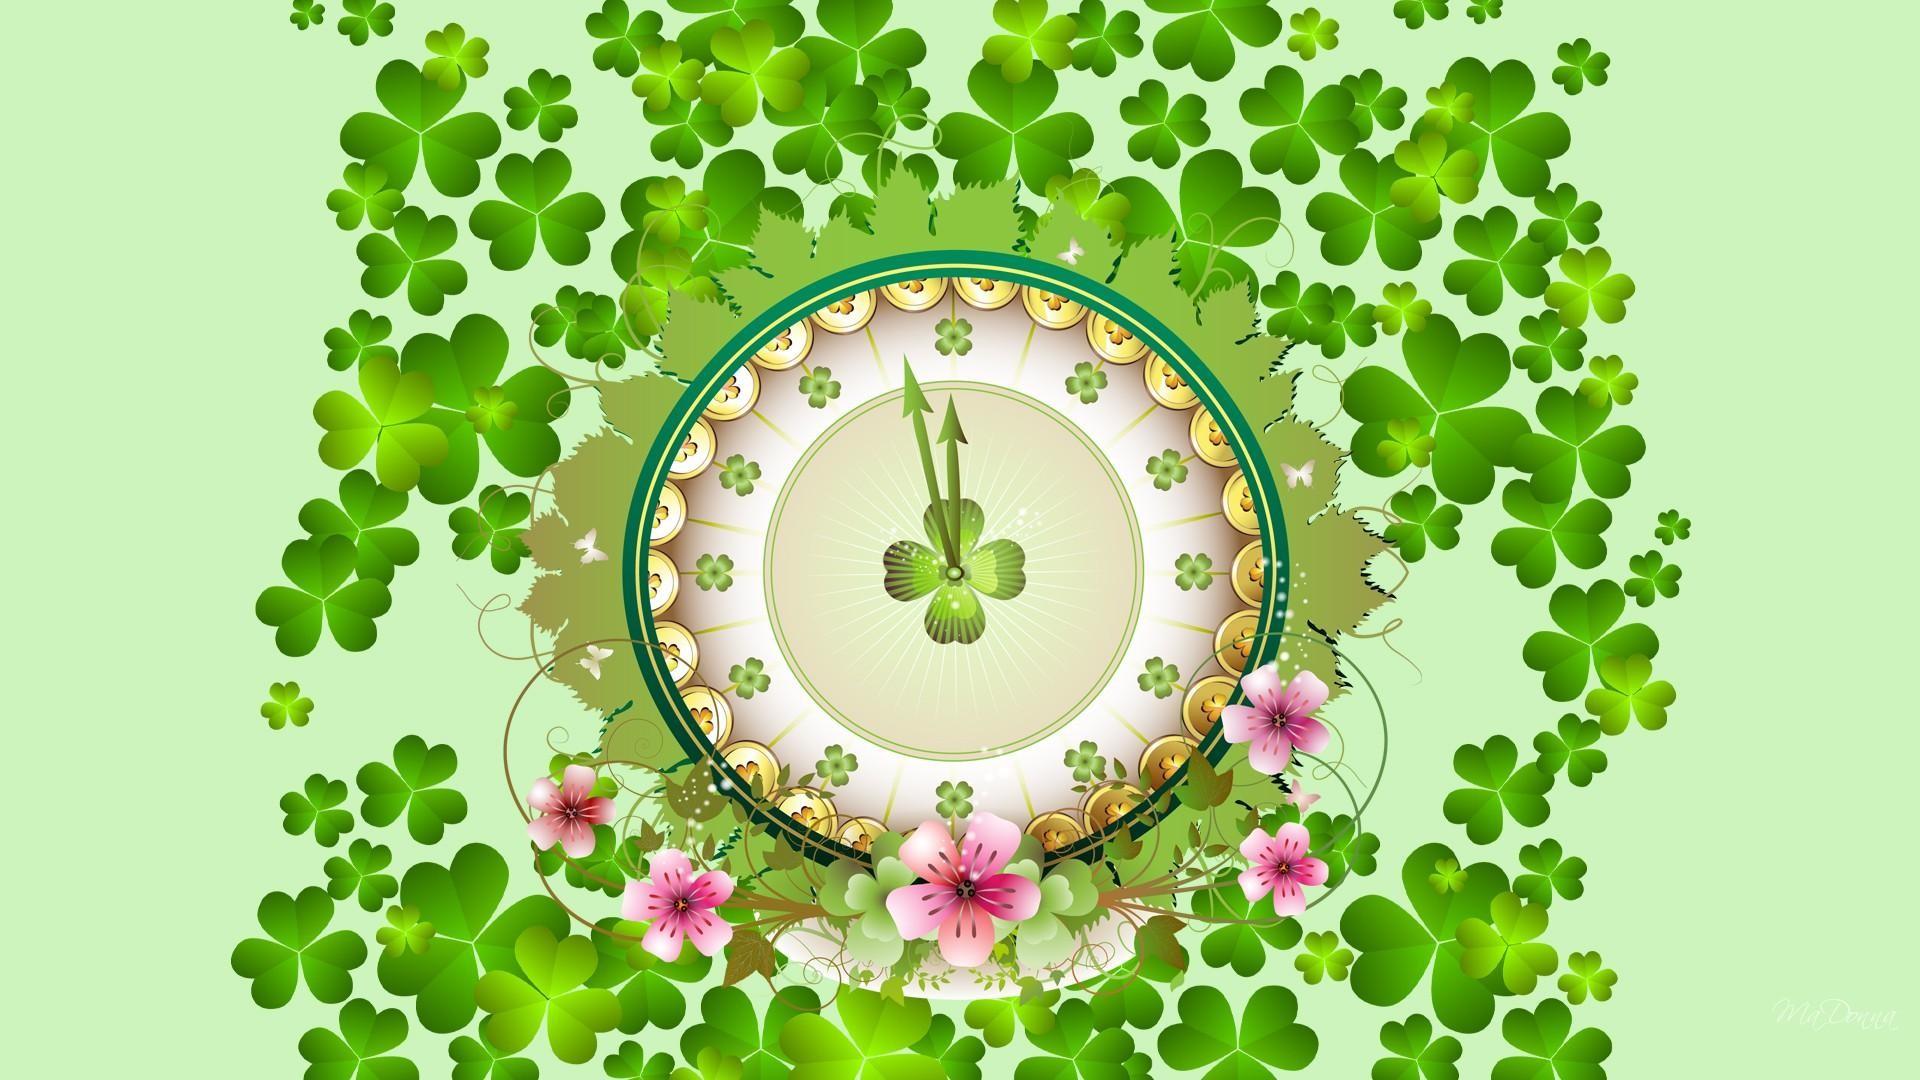 St Patricks Day Wallpaper   Four Leaf Clovers Clip Art 1920x1080